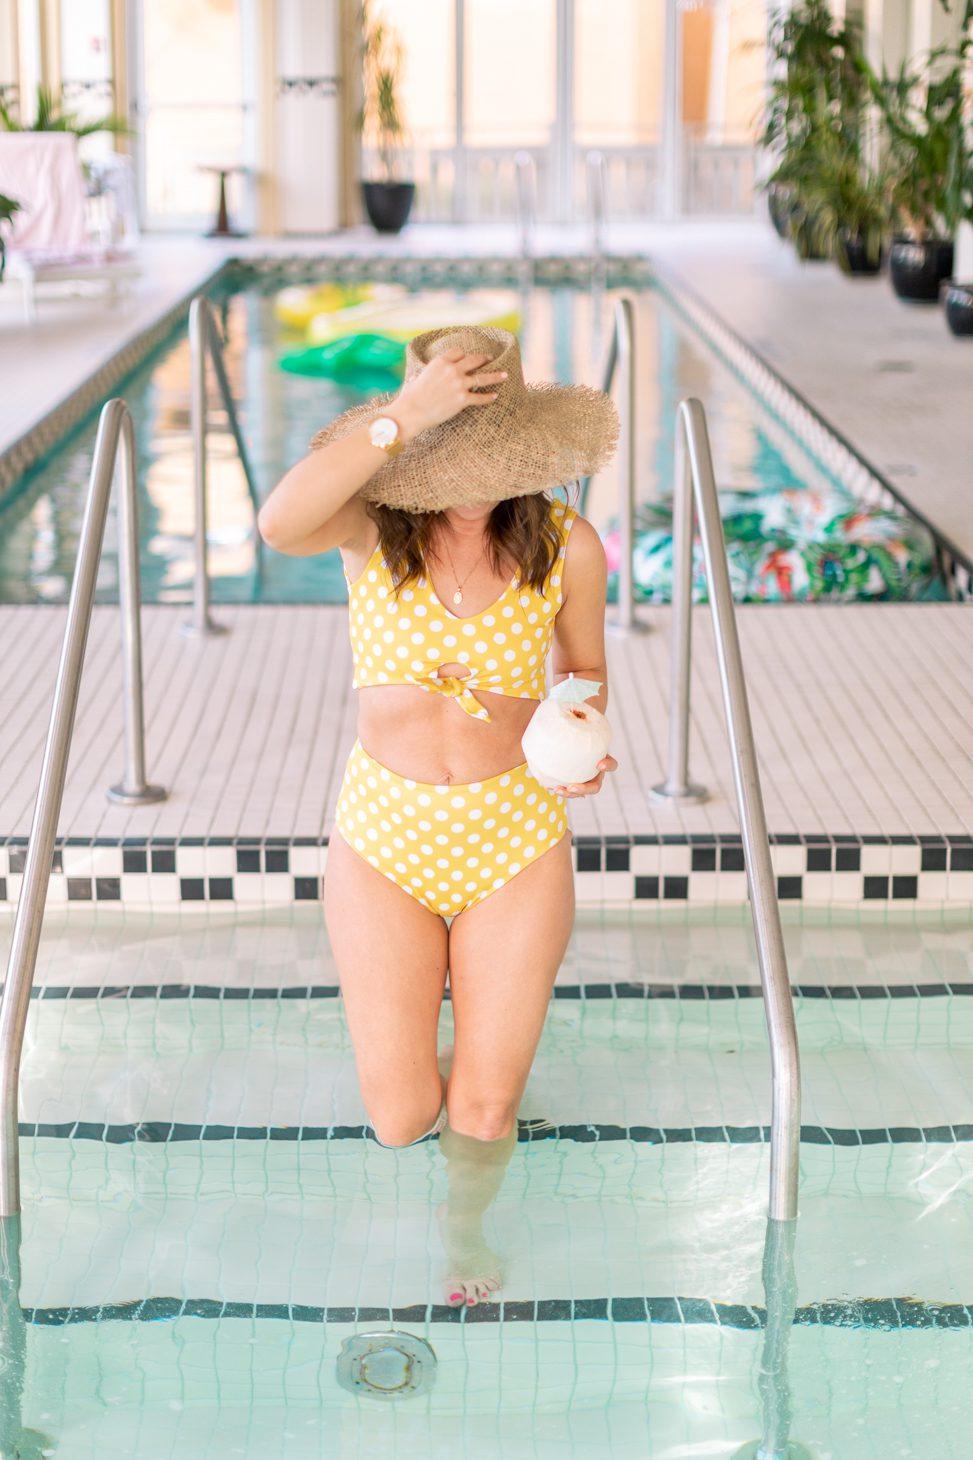 Jillian Harris x Imagine Perry Women's Swimsuit Collaboration